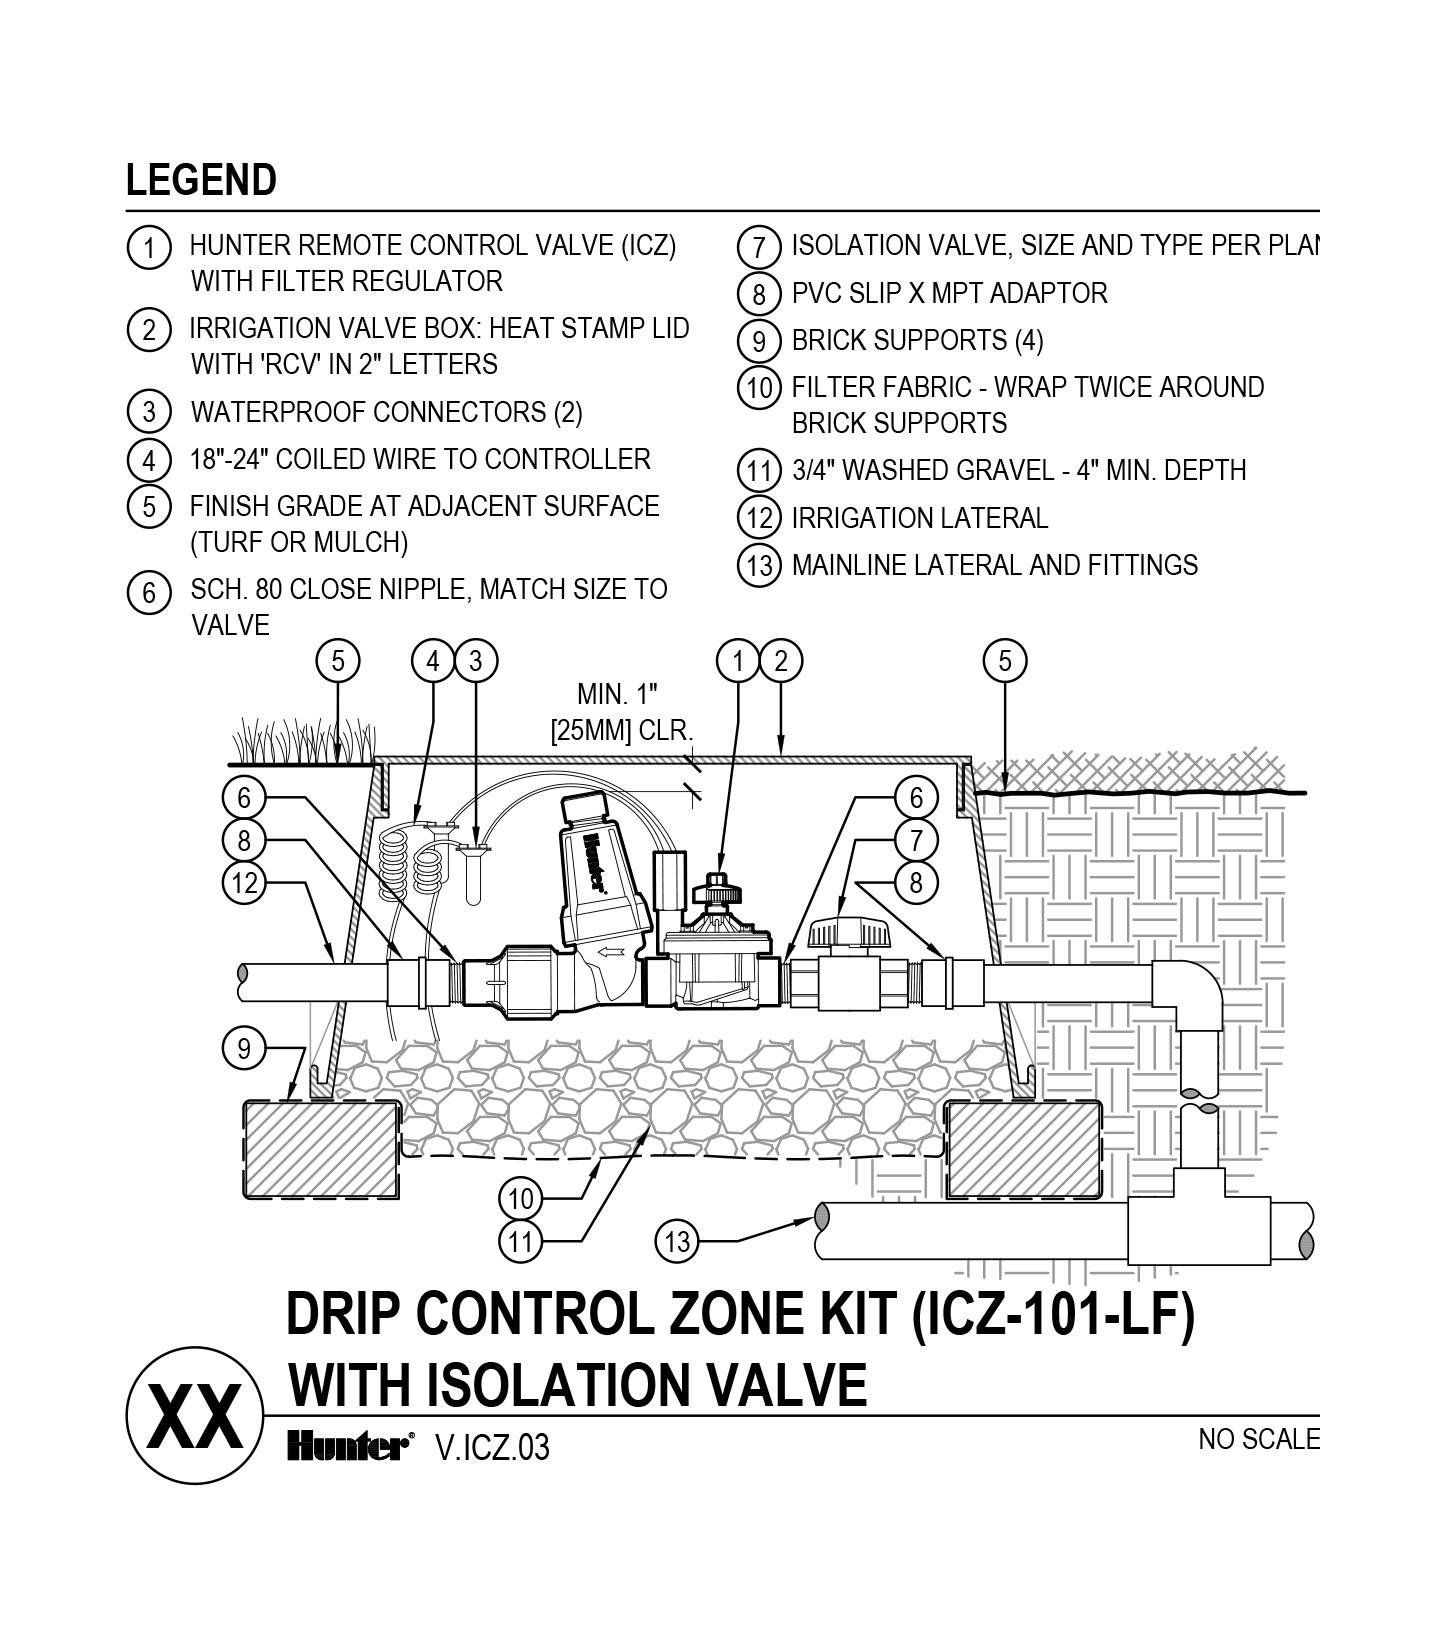 CAD - ICZ-101-LF with Shutoff Valve